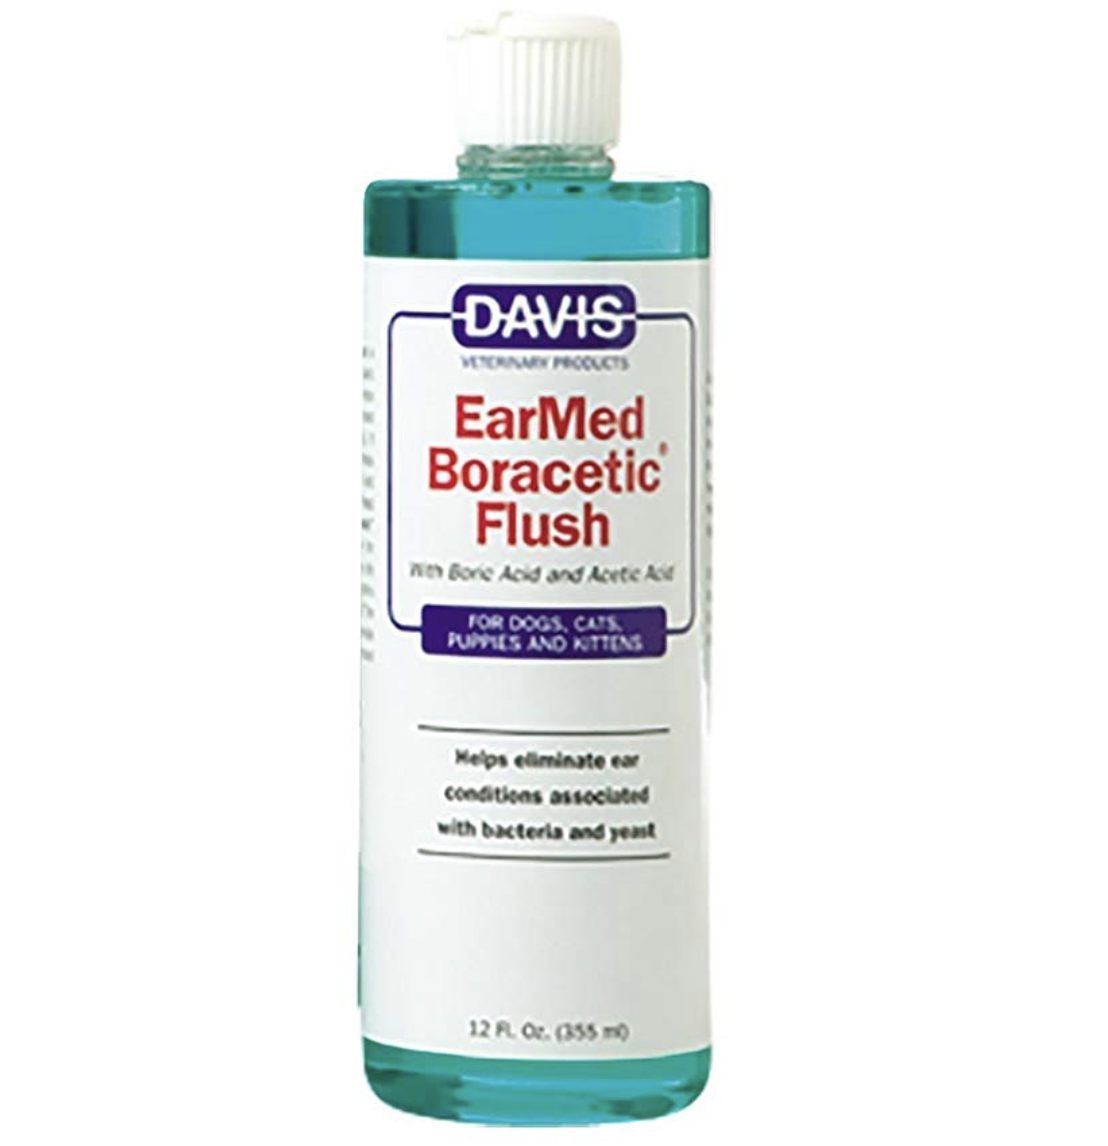 Davis EarMed Boracetic Flush